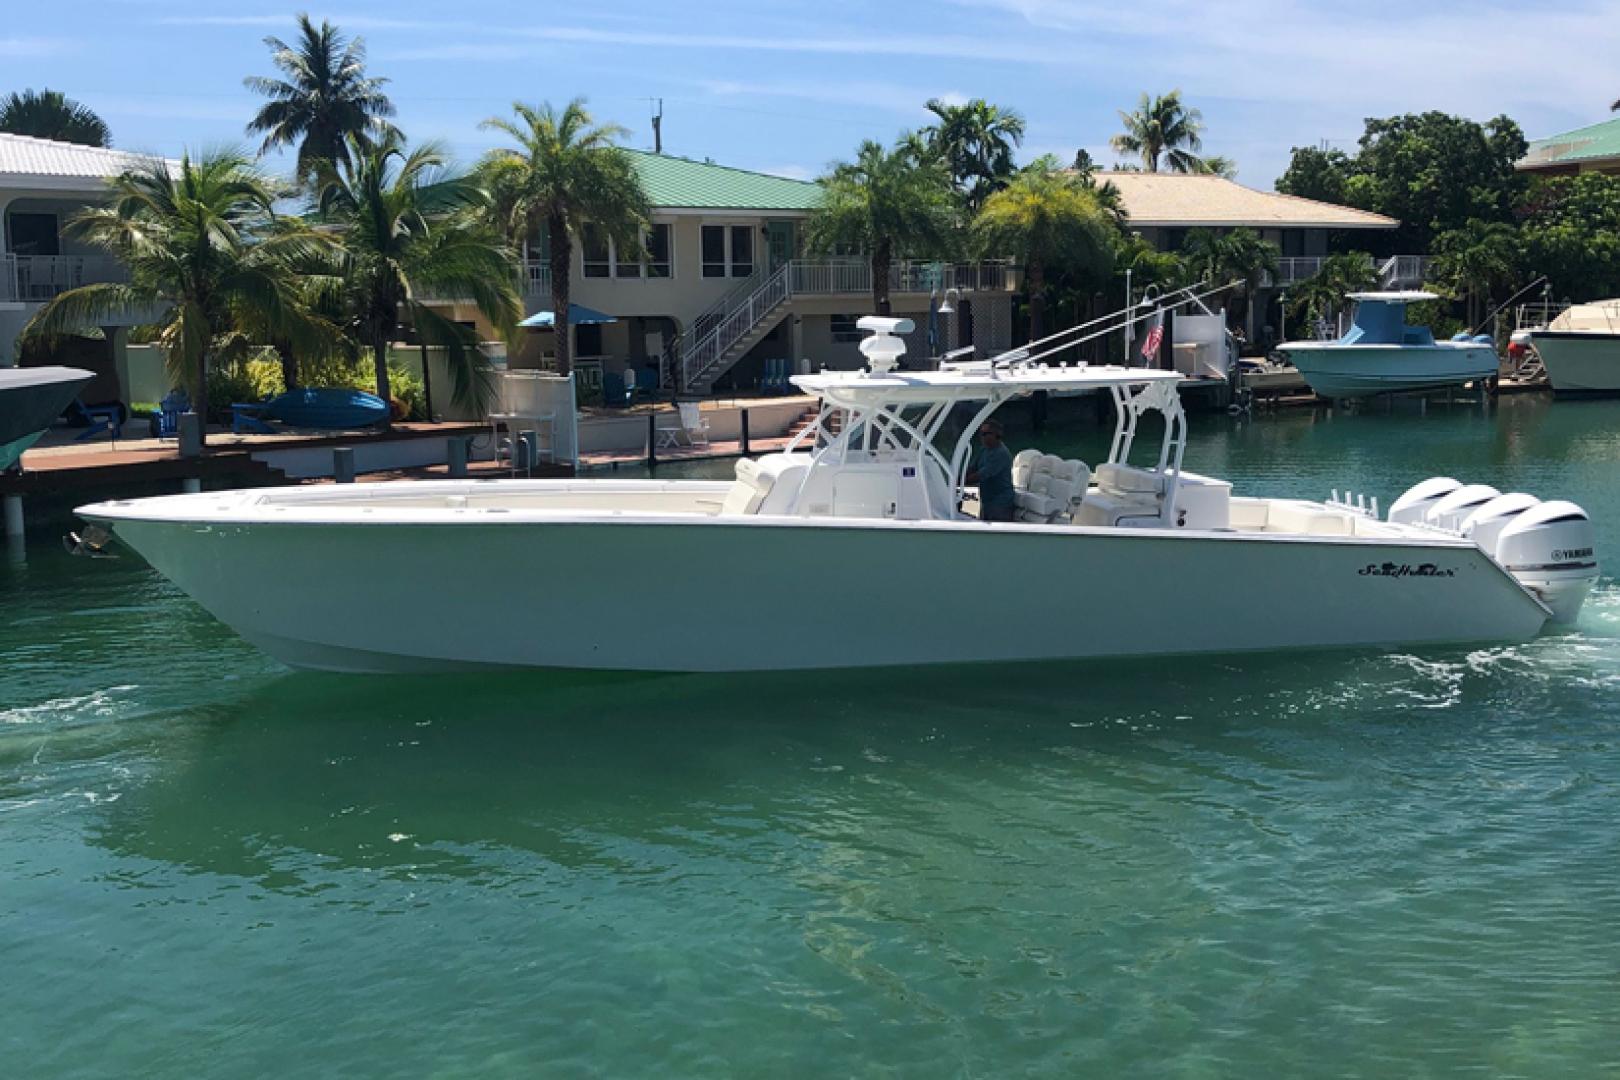 SeaHunter-45 Center Console 2016-No Name Bal Harbour-Florida-United States-2016 Sea Hunter 45 Center Console  Profile-1469672   Thumbnail